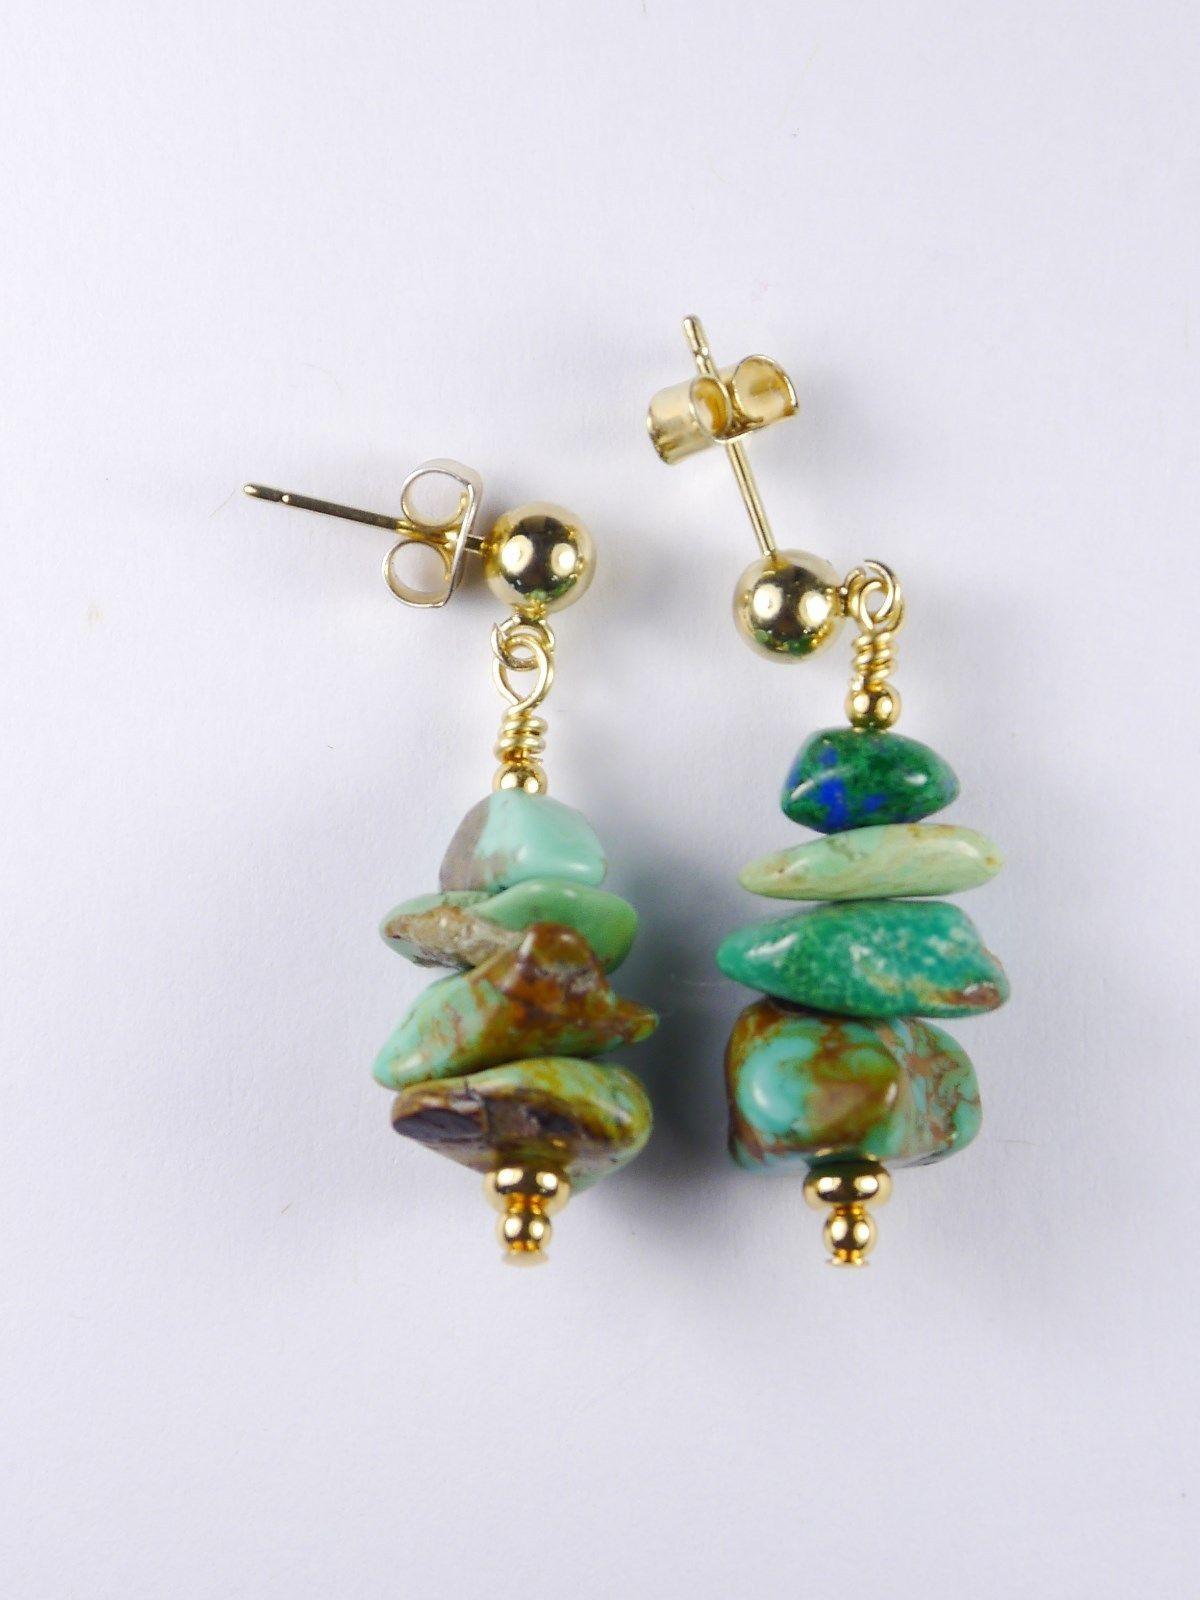 Turquoise Nugget / Kingman Arizona / Blue-Green / Earrings w/ 14/20k Gold / USA